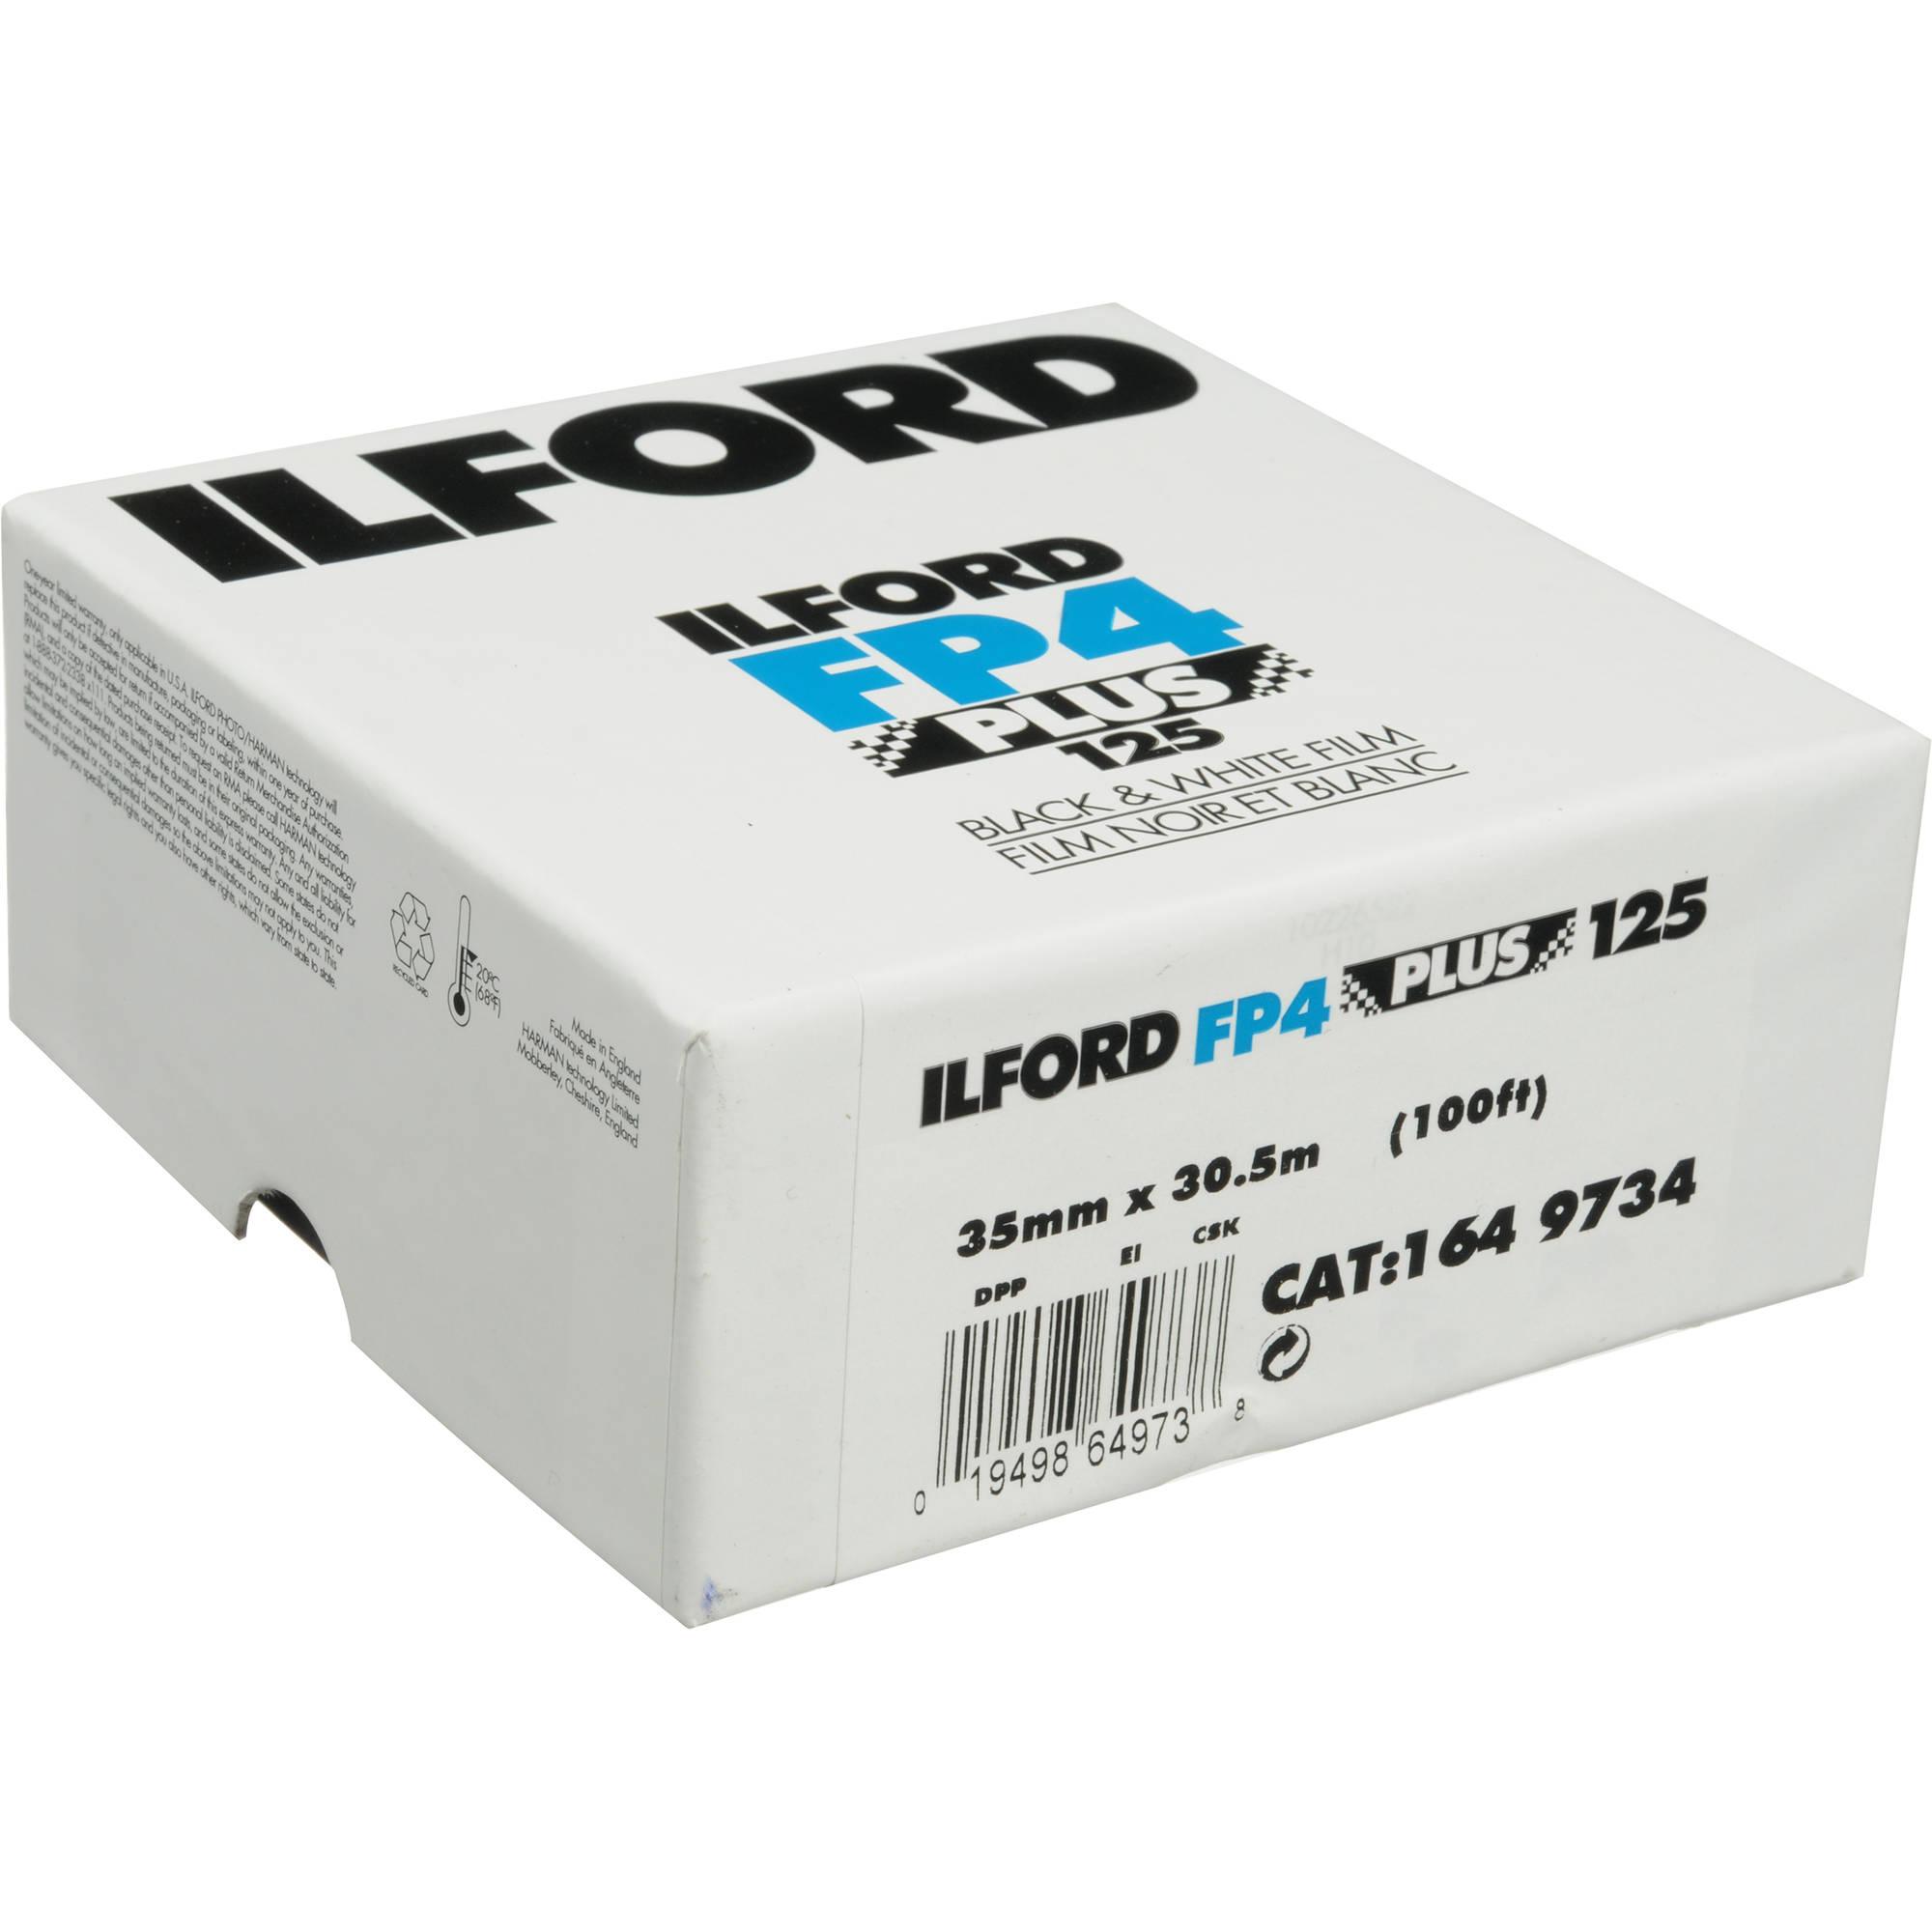 24 Exposures Ilford Black and White FP4 Plus 35mm Film Fine Grain Medium Speed ISO 125 5 Pack